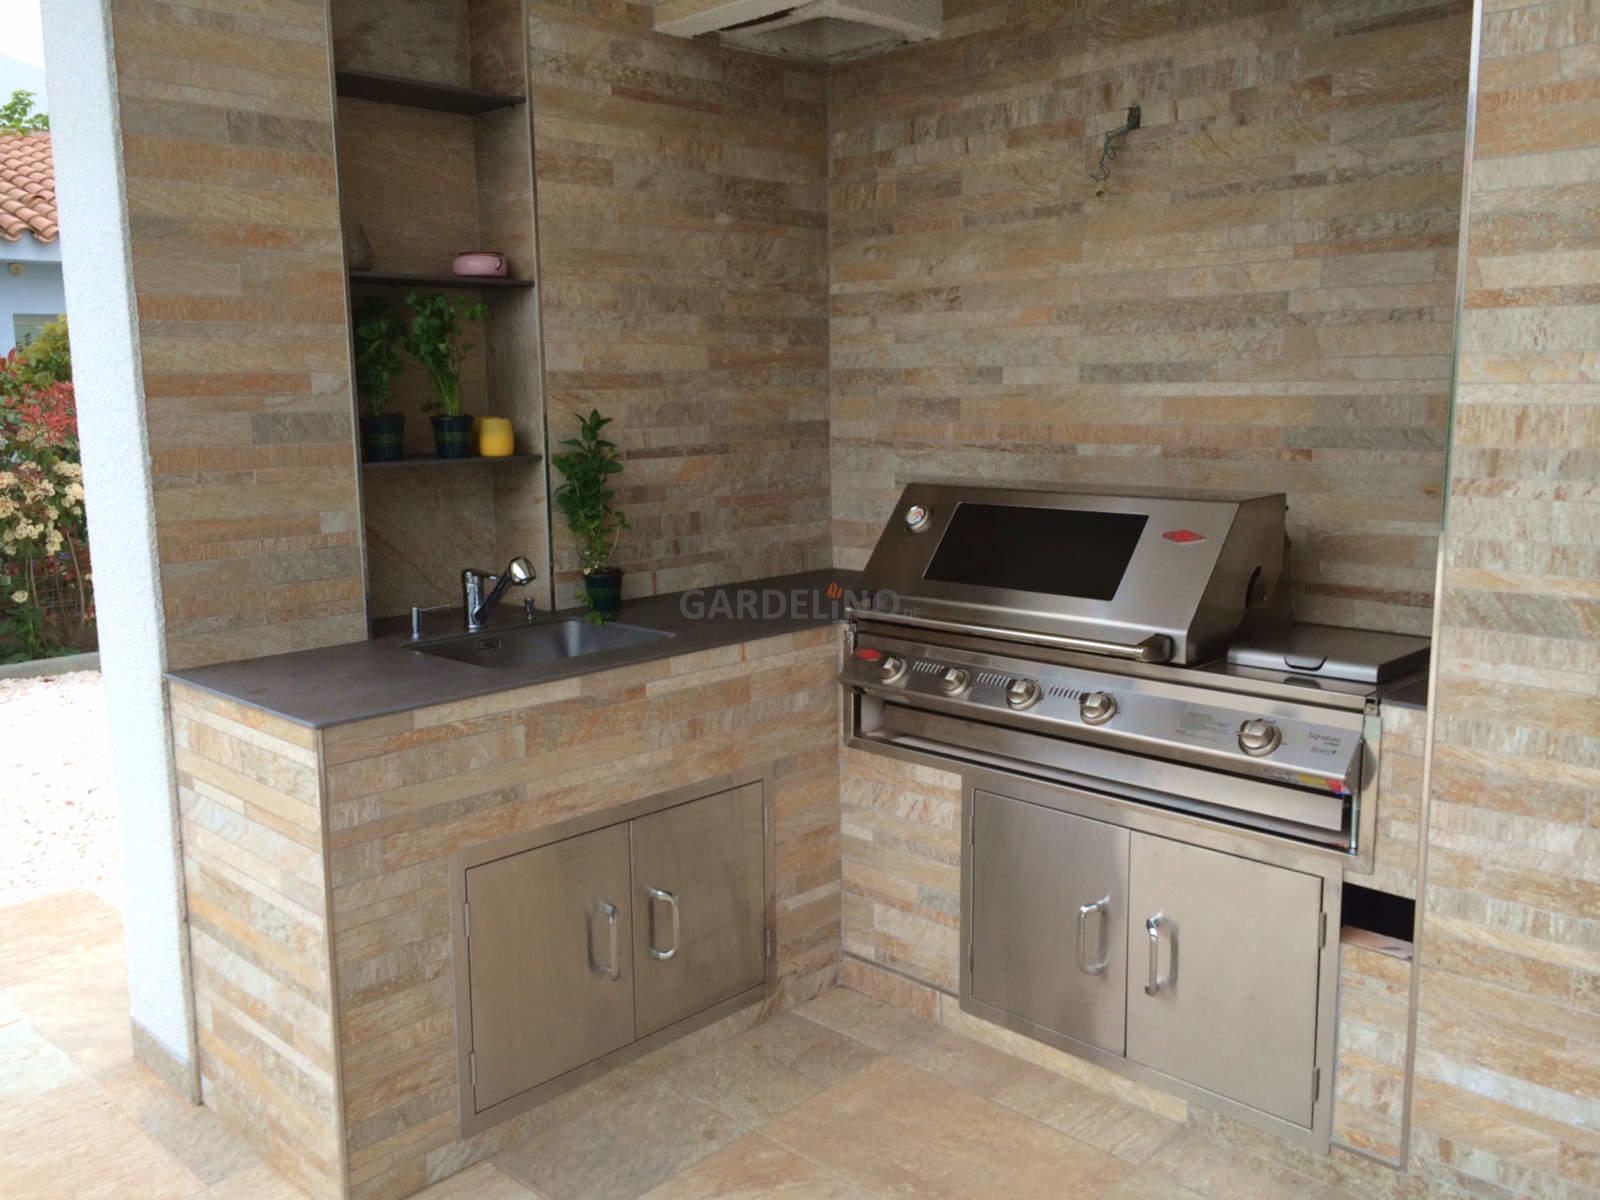 einbaugrill shop built in grill vom outdoor k chen profi. Black Bedroom Furniture Sets. Home Design Ideas